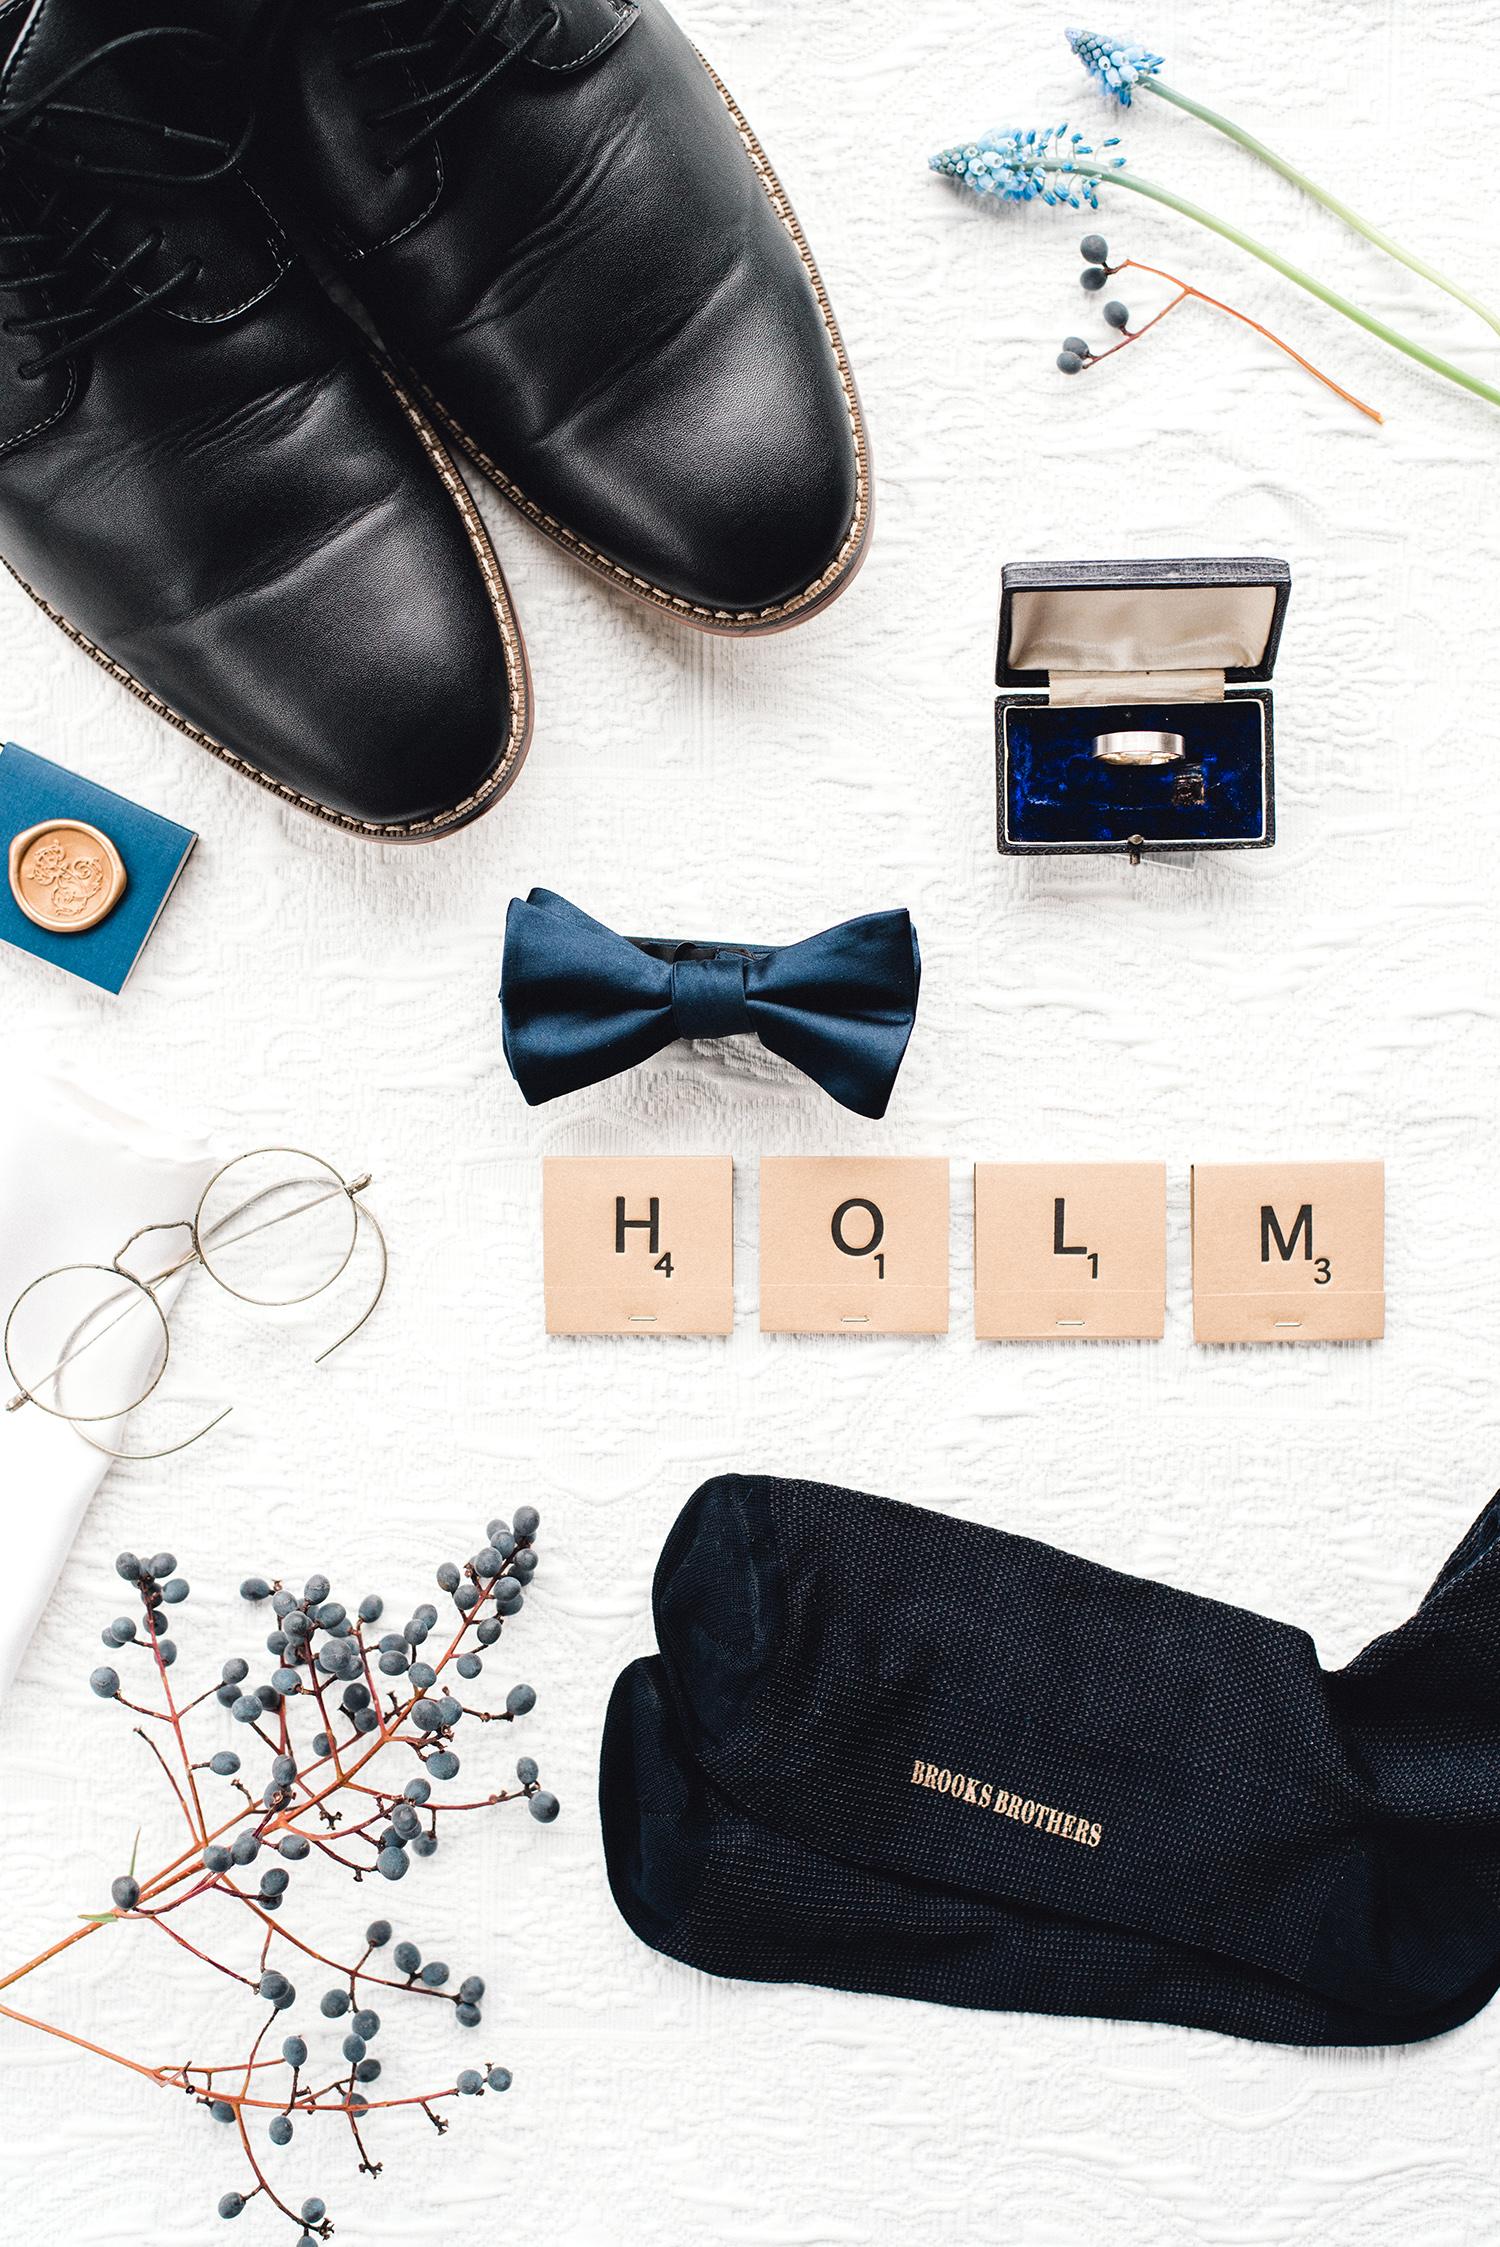 johanna erik wedding groom accessories